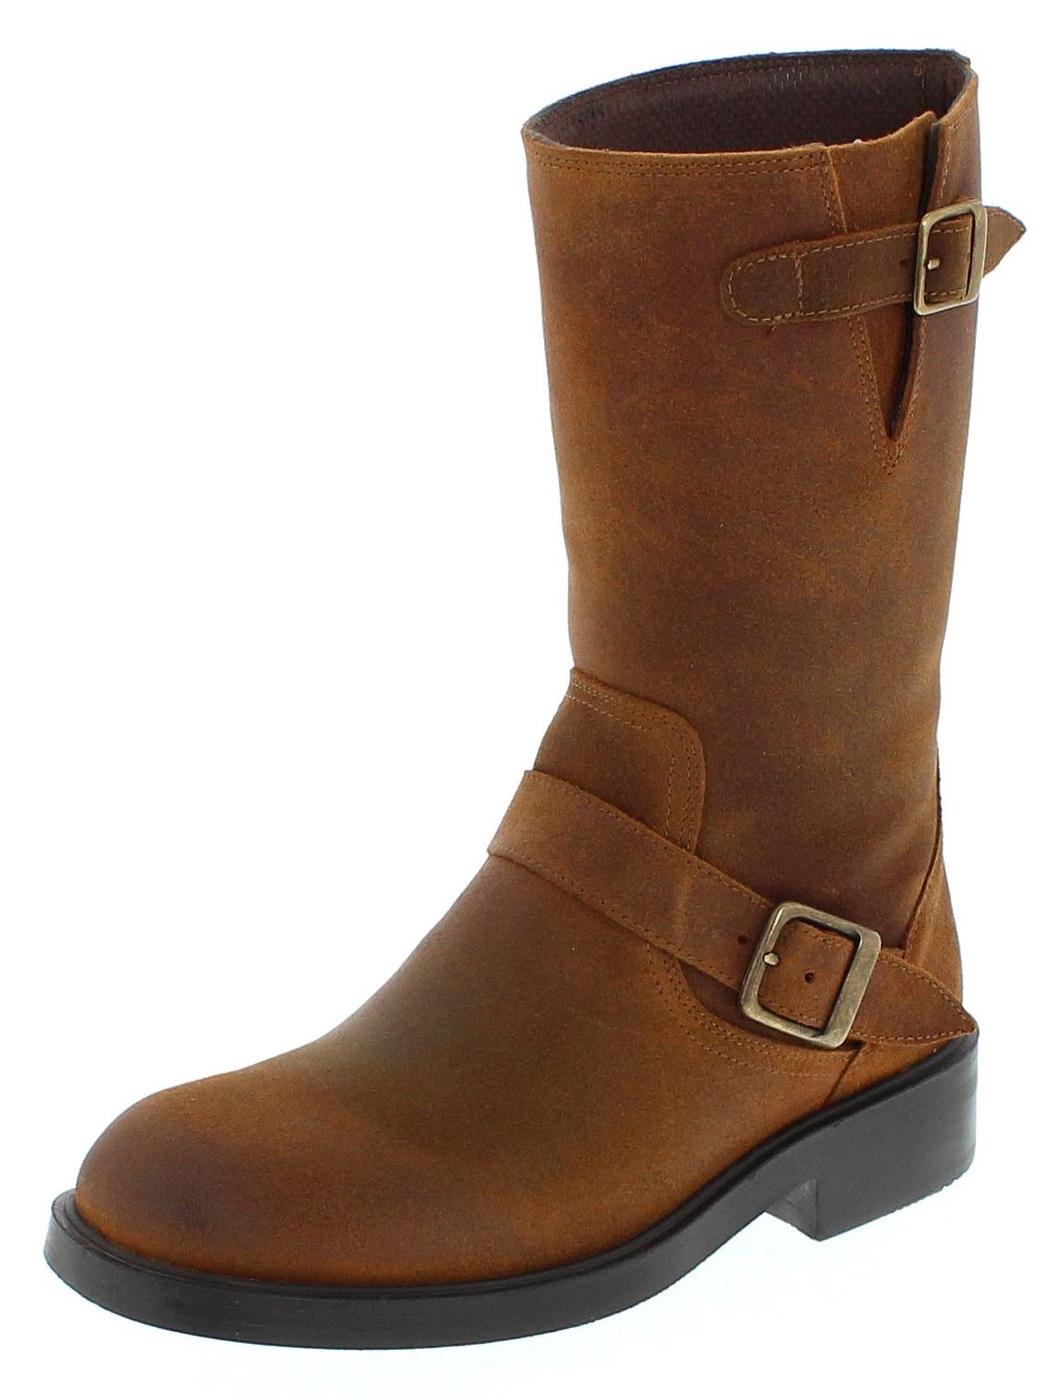 Fashion Boots BU2006 Whisky Engineer Stiefel ohne Stahlkappe - braun